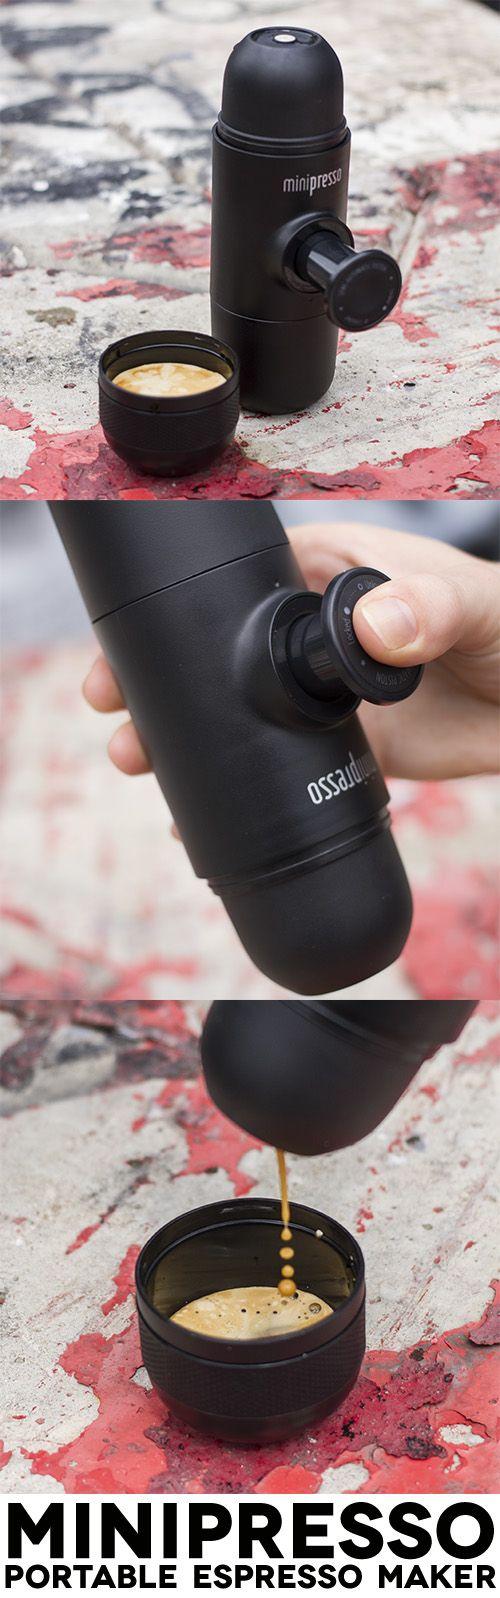 An ingenious hand-powered portable espresso maker